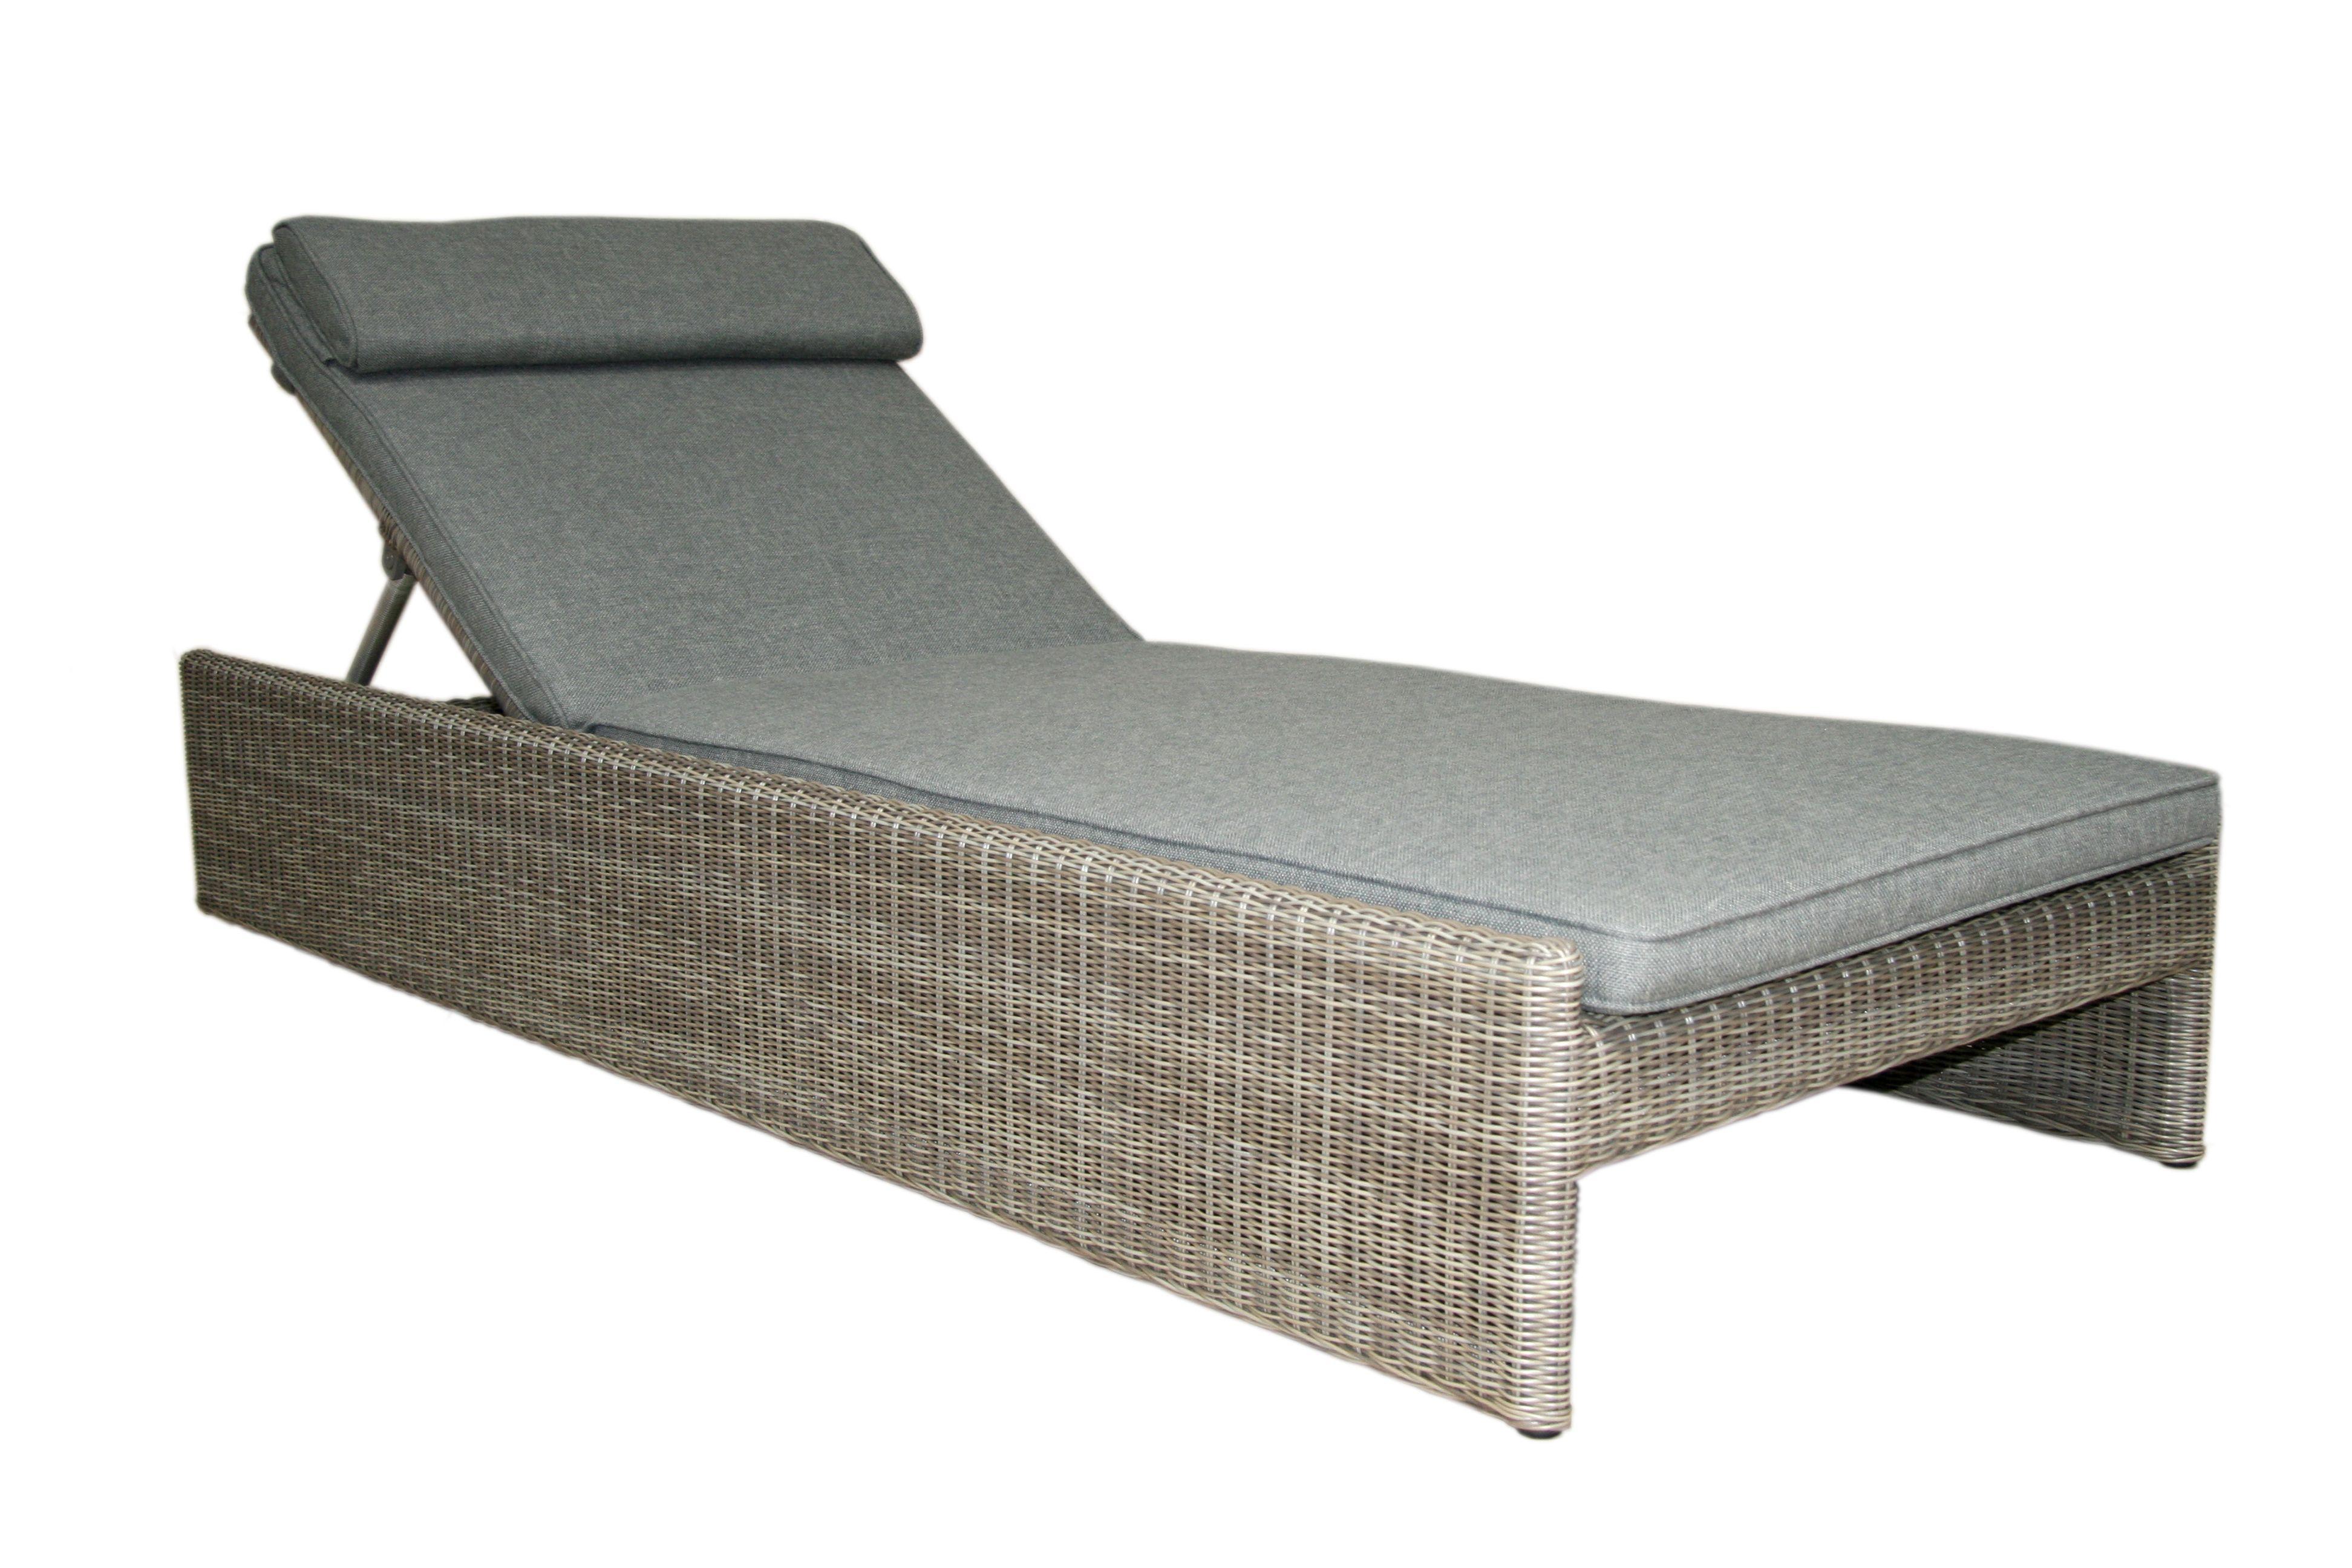 g nial bain de soleil java wicker id es de bain de soleil. Black Bedroom Furniture Sets. Home Design Ideas